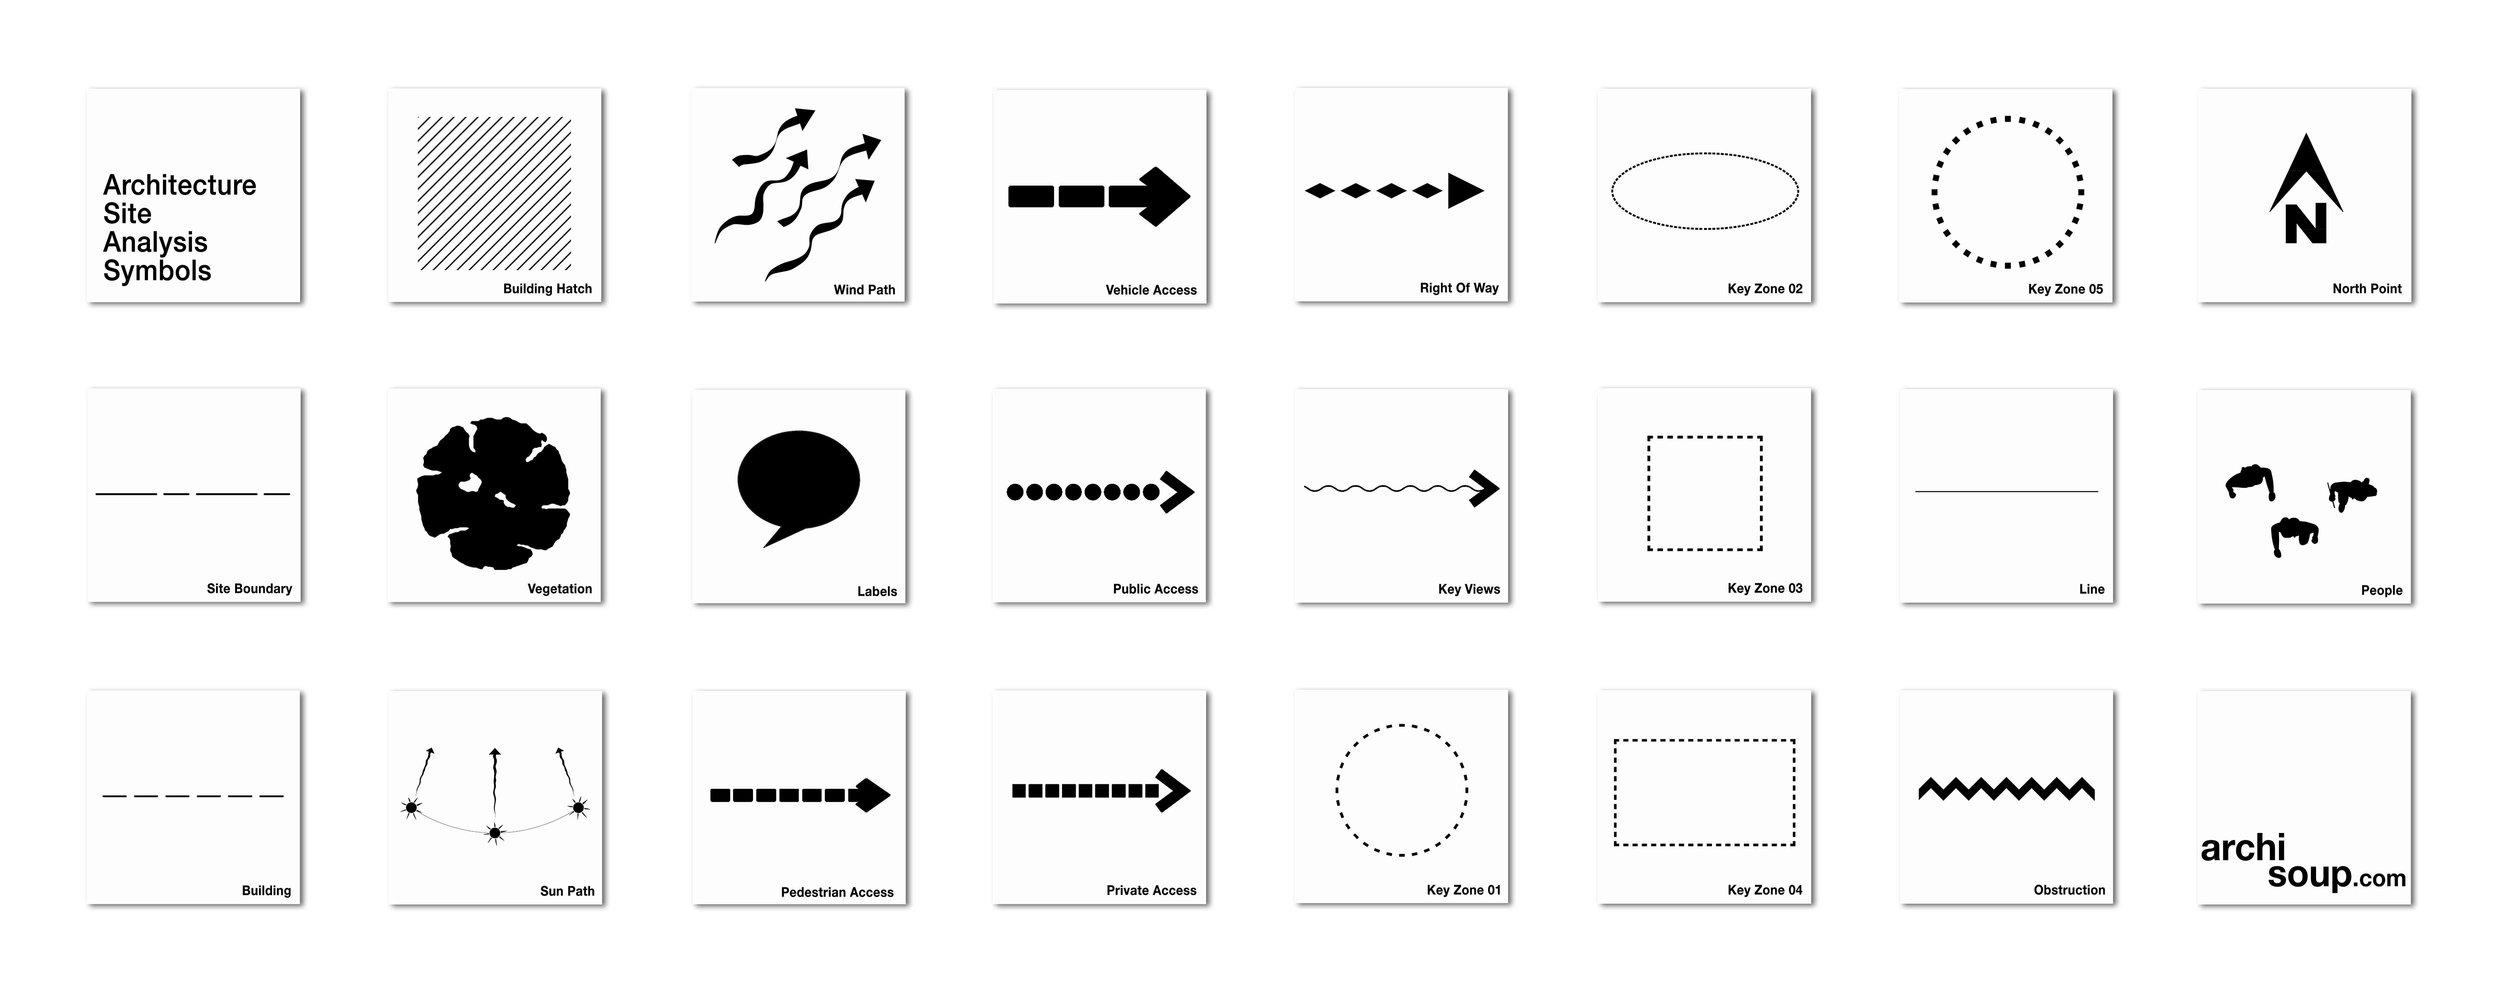 Site analysis drawings